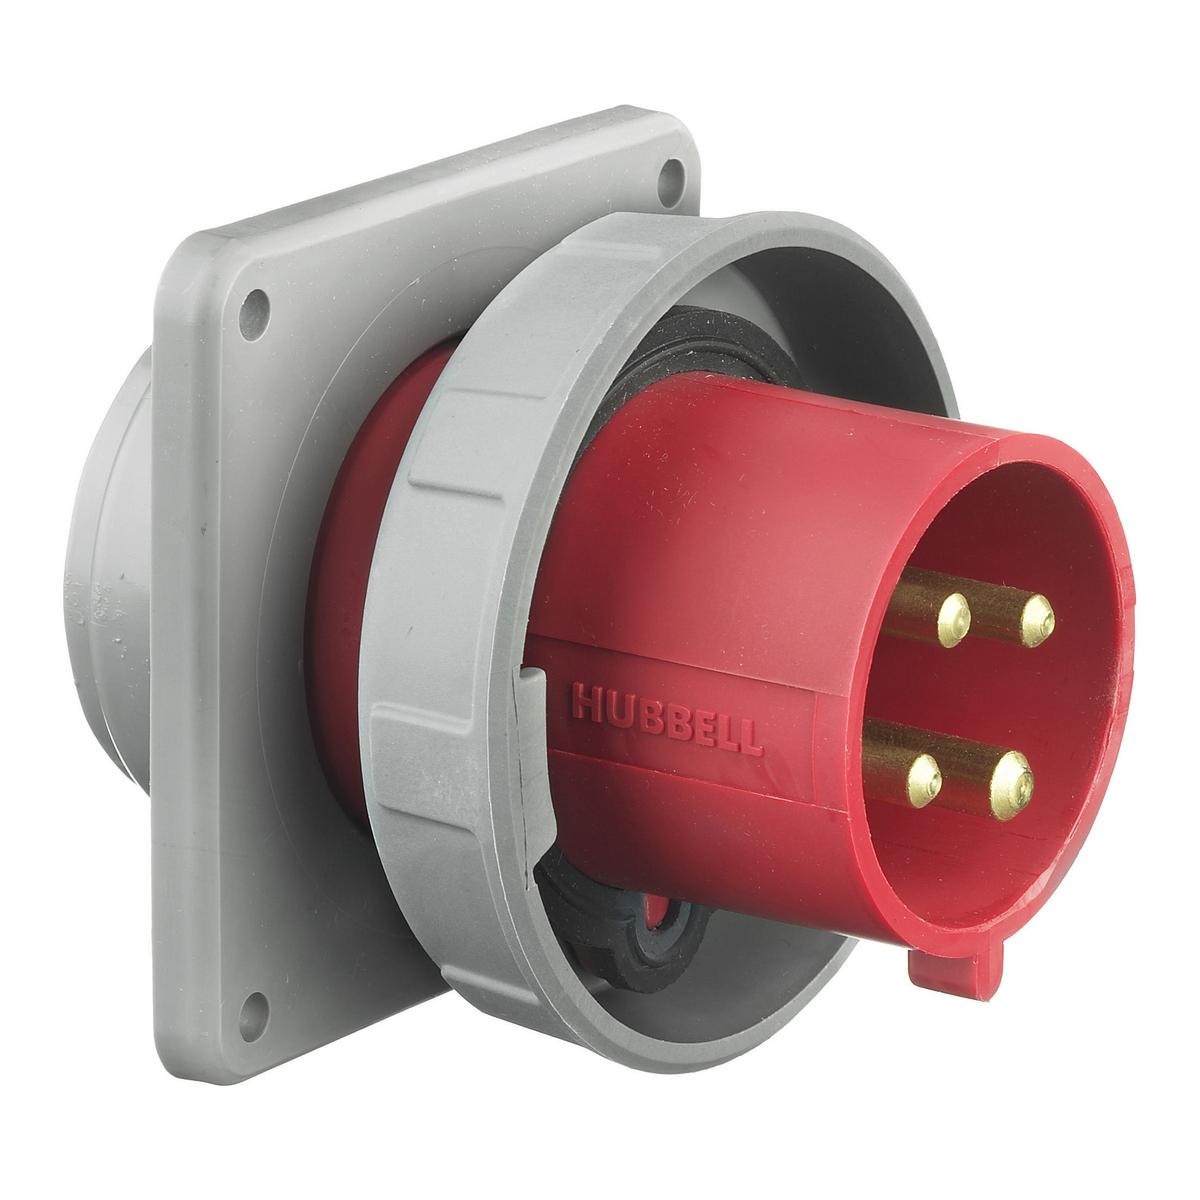 Hubbell HBL432B6W PS, IEC, INLET, 3P4W, 32A 380-415V, w/T